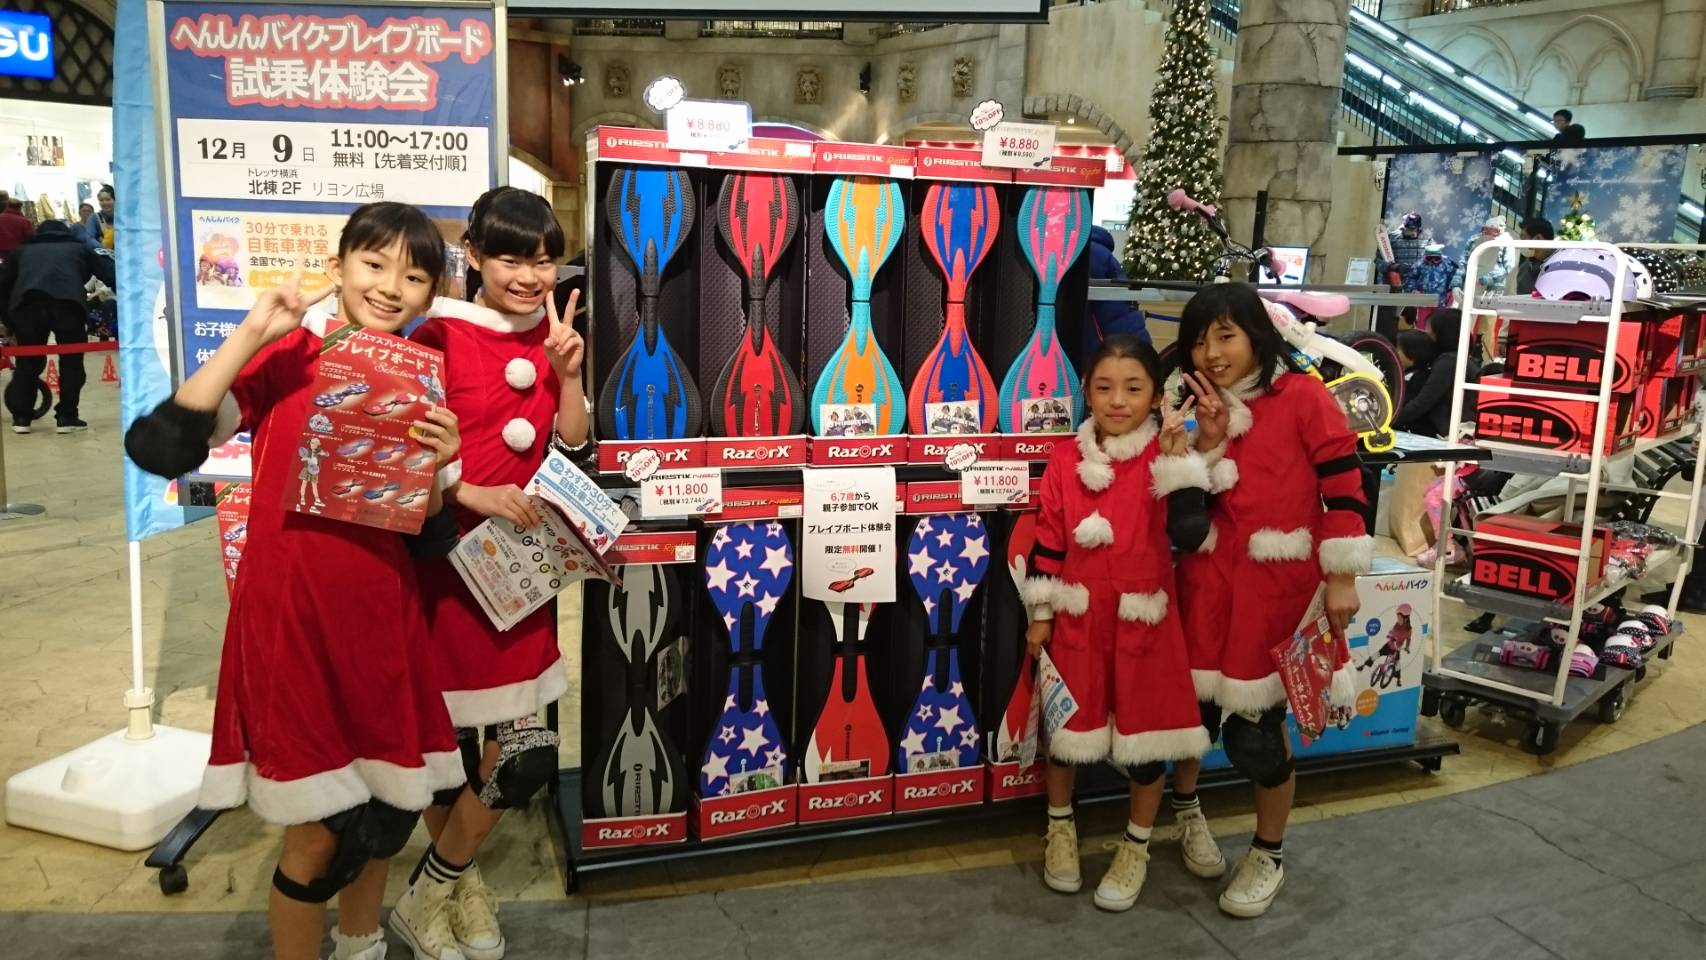 BBGクリスマスイベント サンタ衣裳